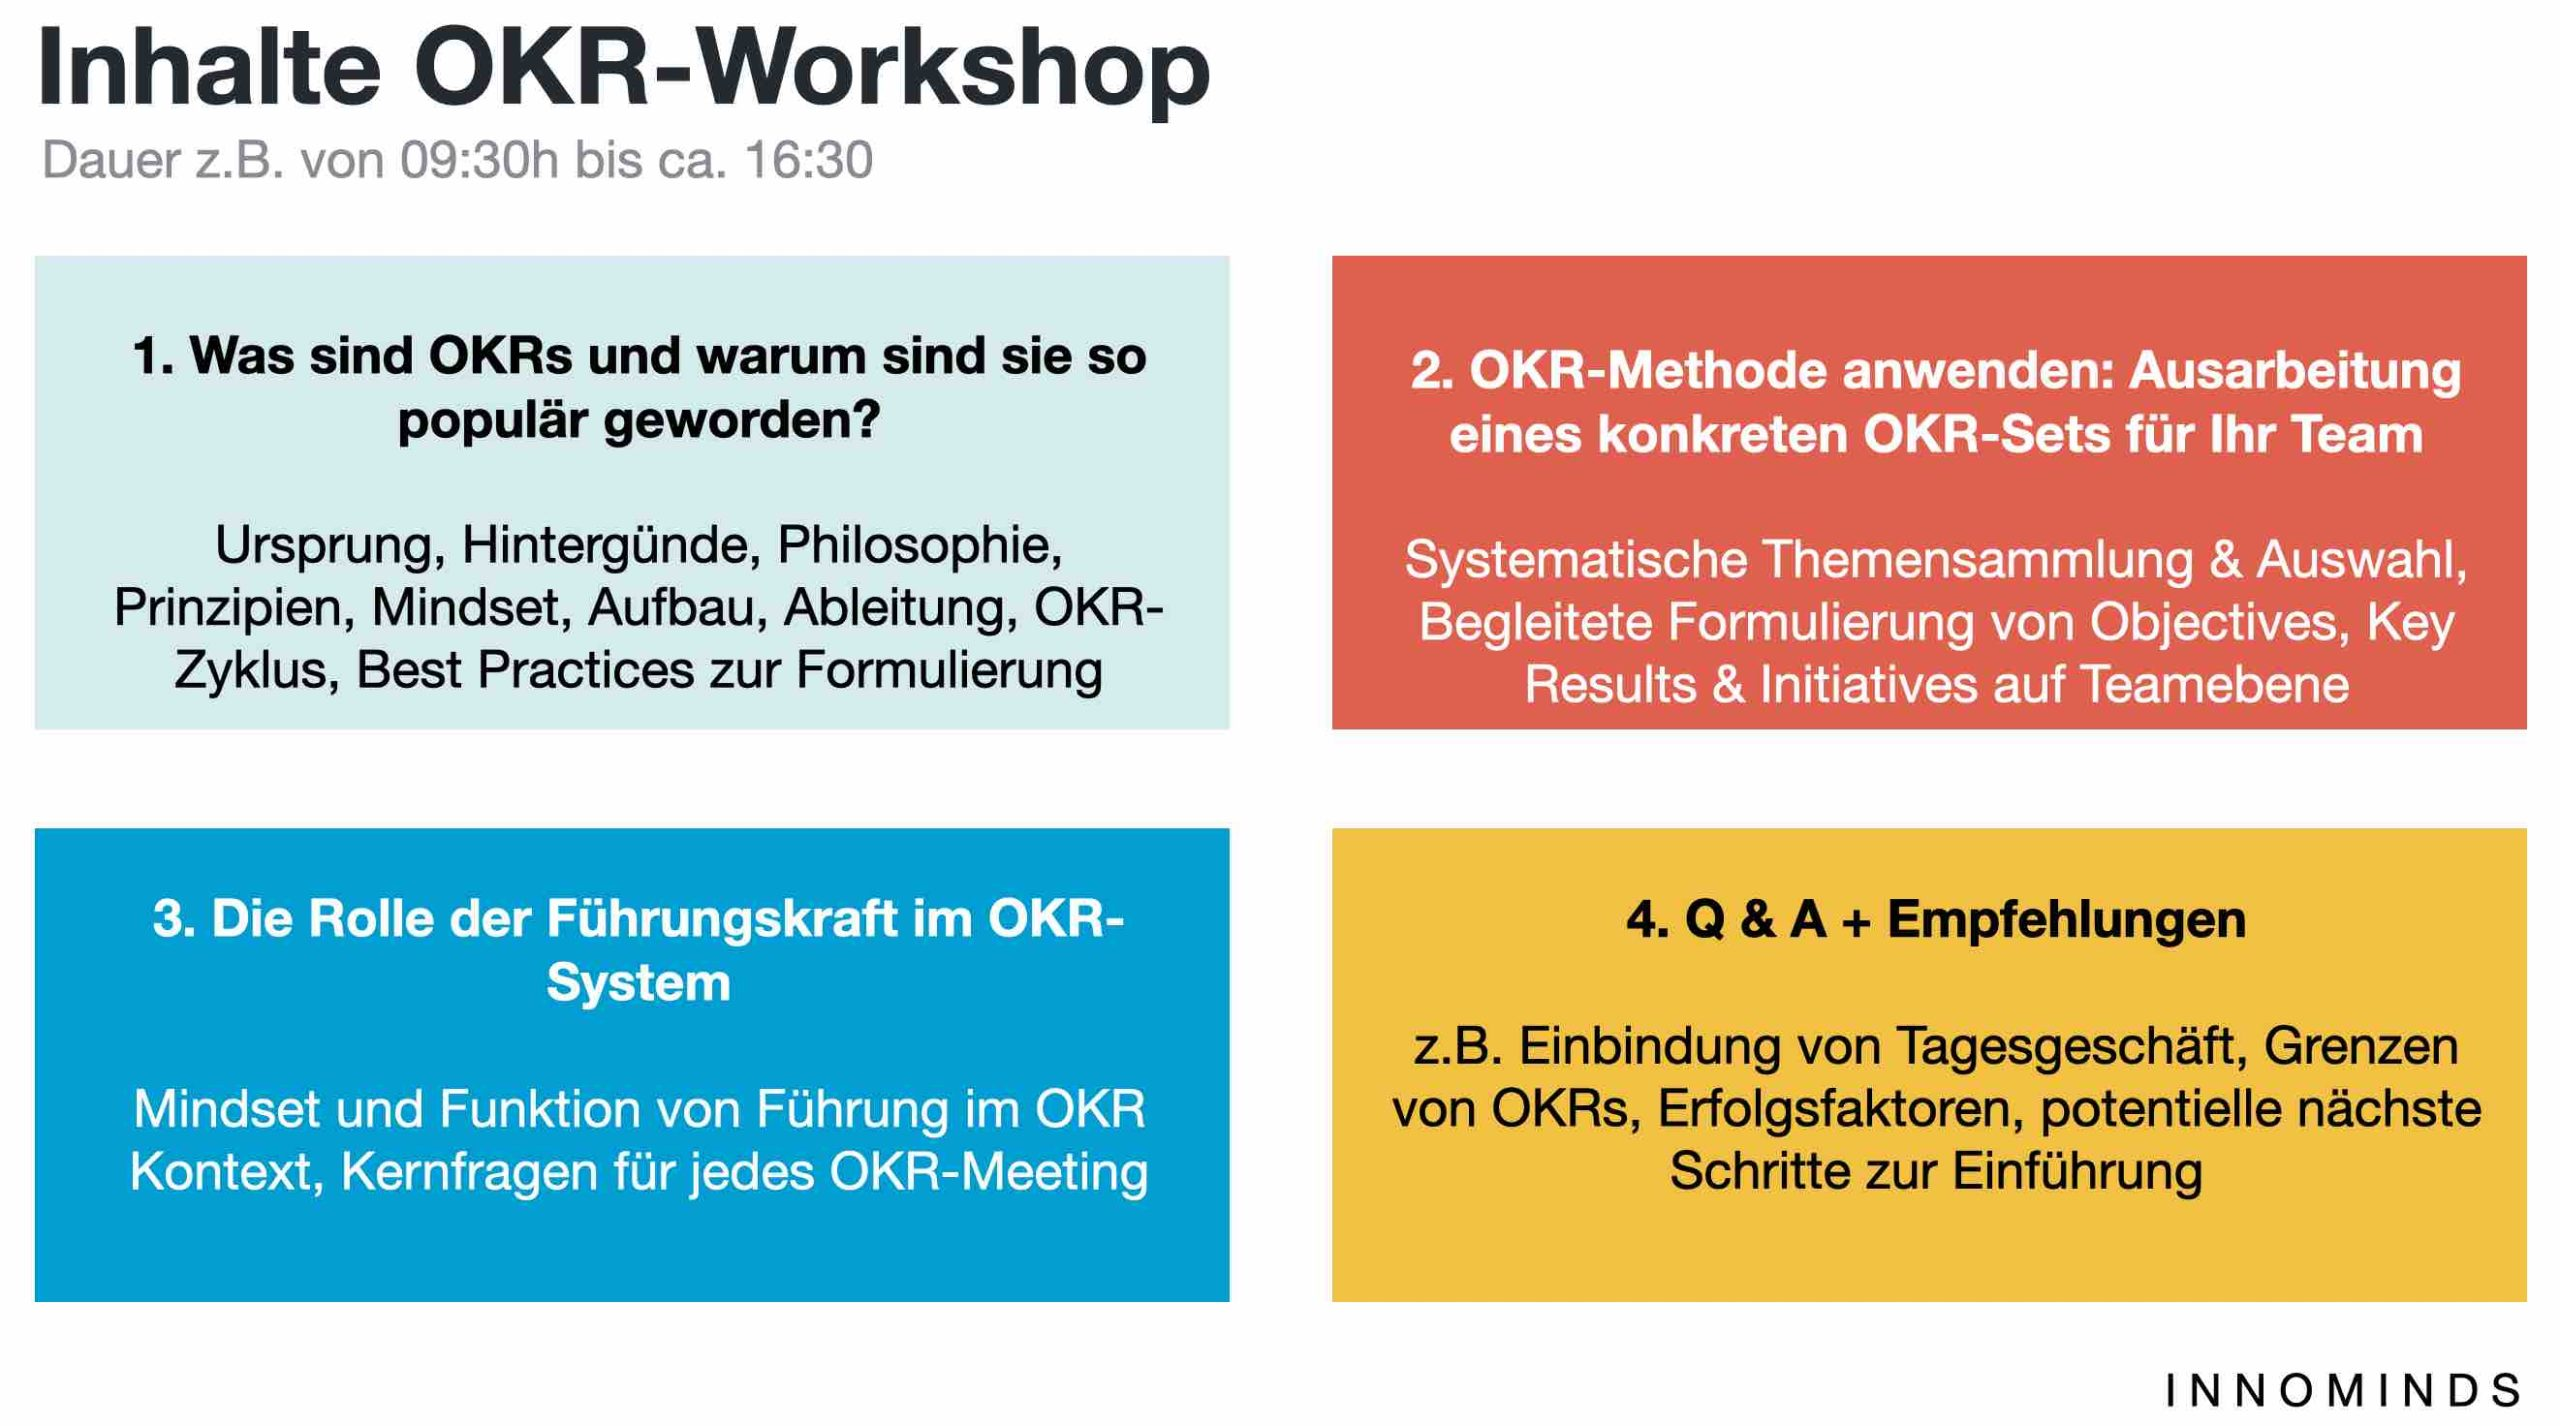 Agenda OKR Workshop